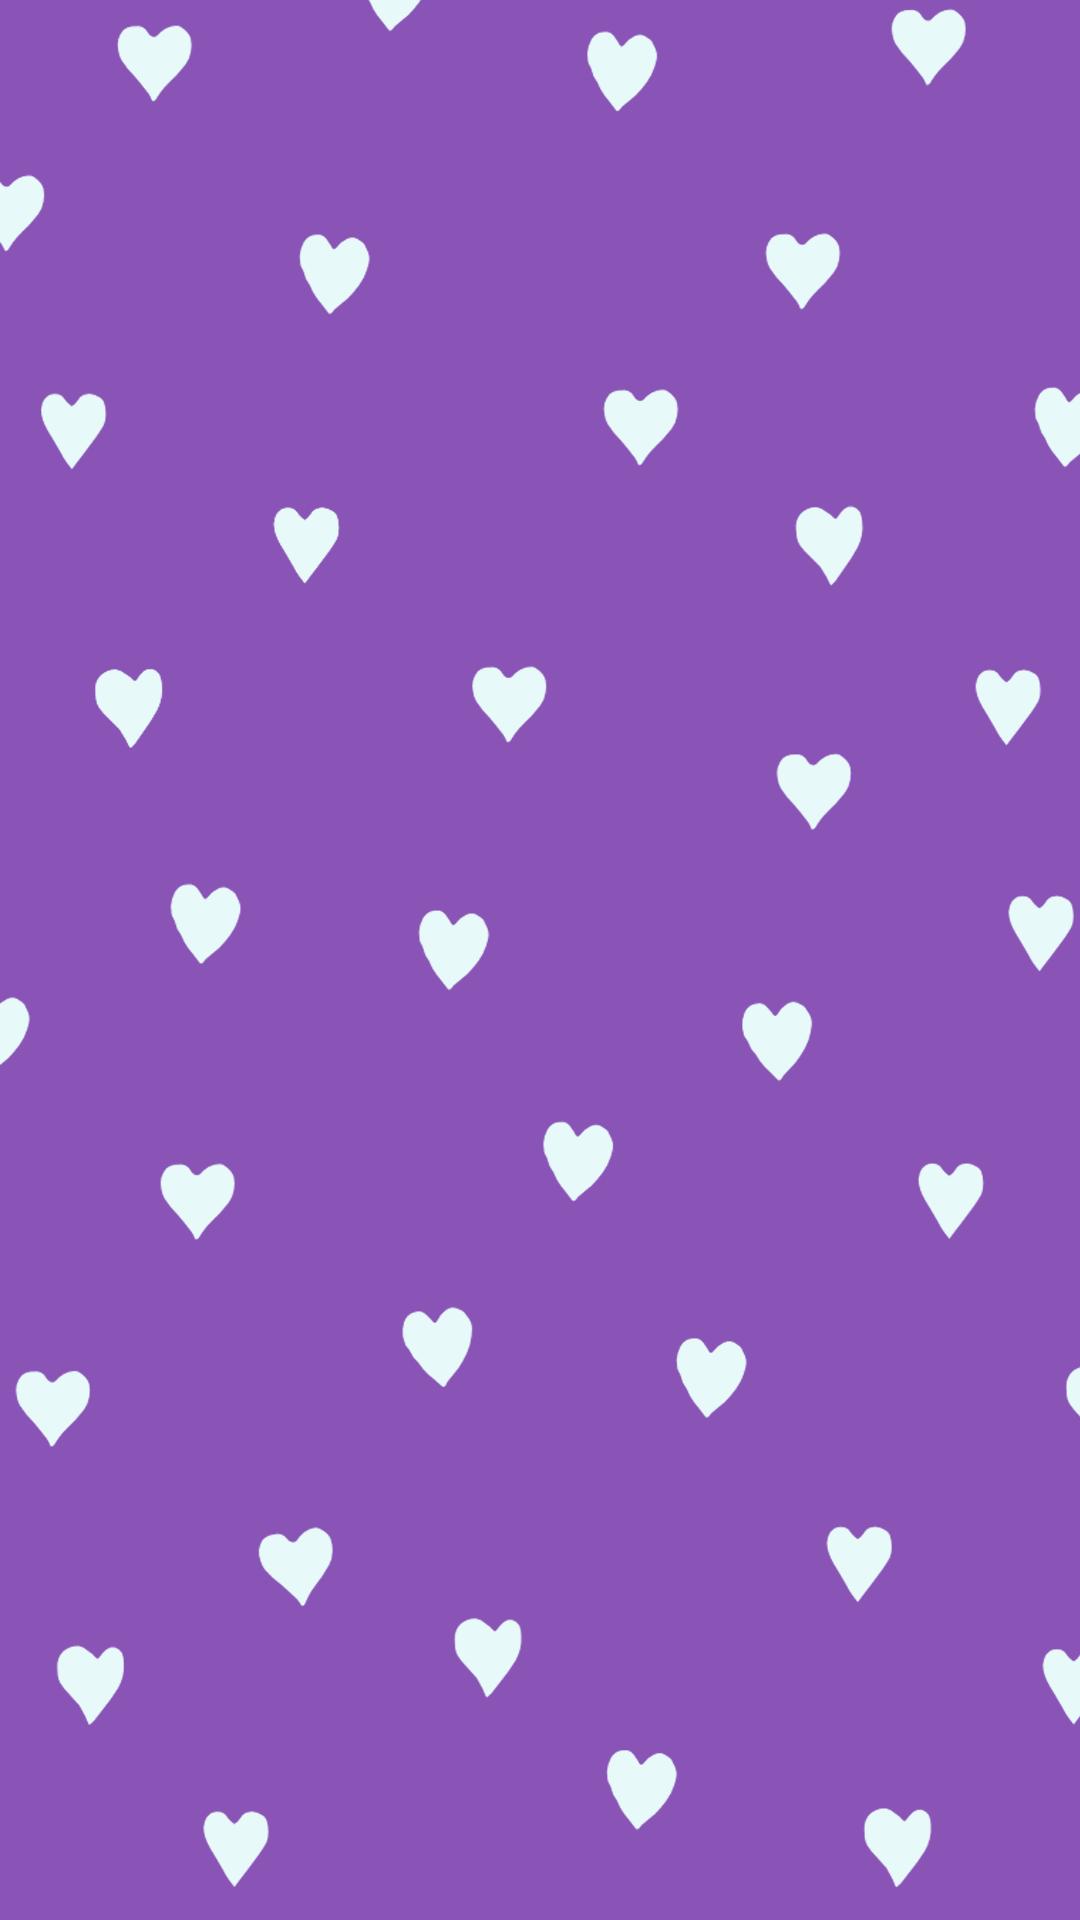 Tapet Purple Hearts Af Gocase In 2020 Purple Wallpaper Purple Wallpaper Iphone Heart Iphone Wallpaper